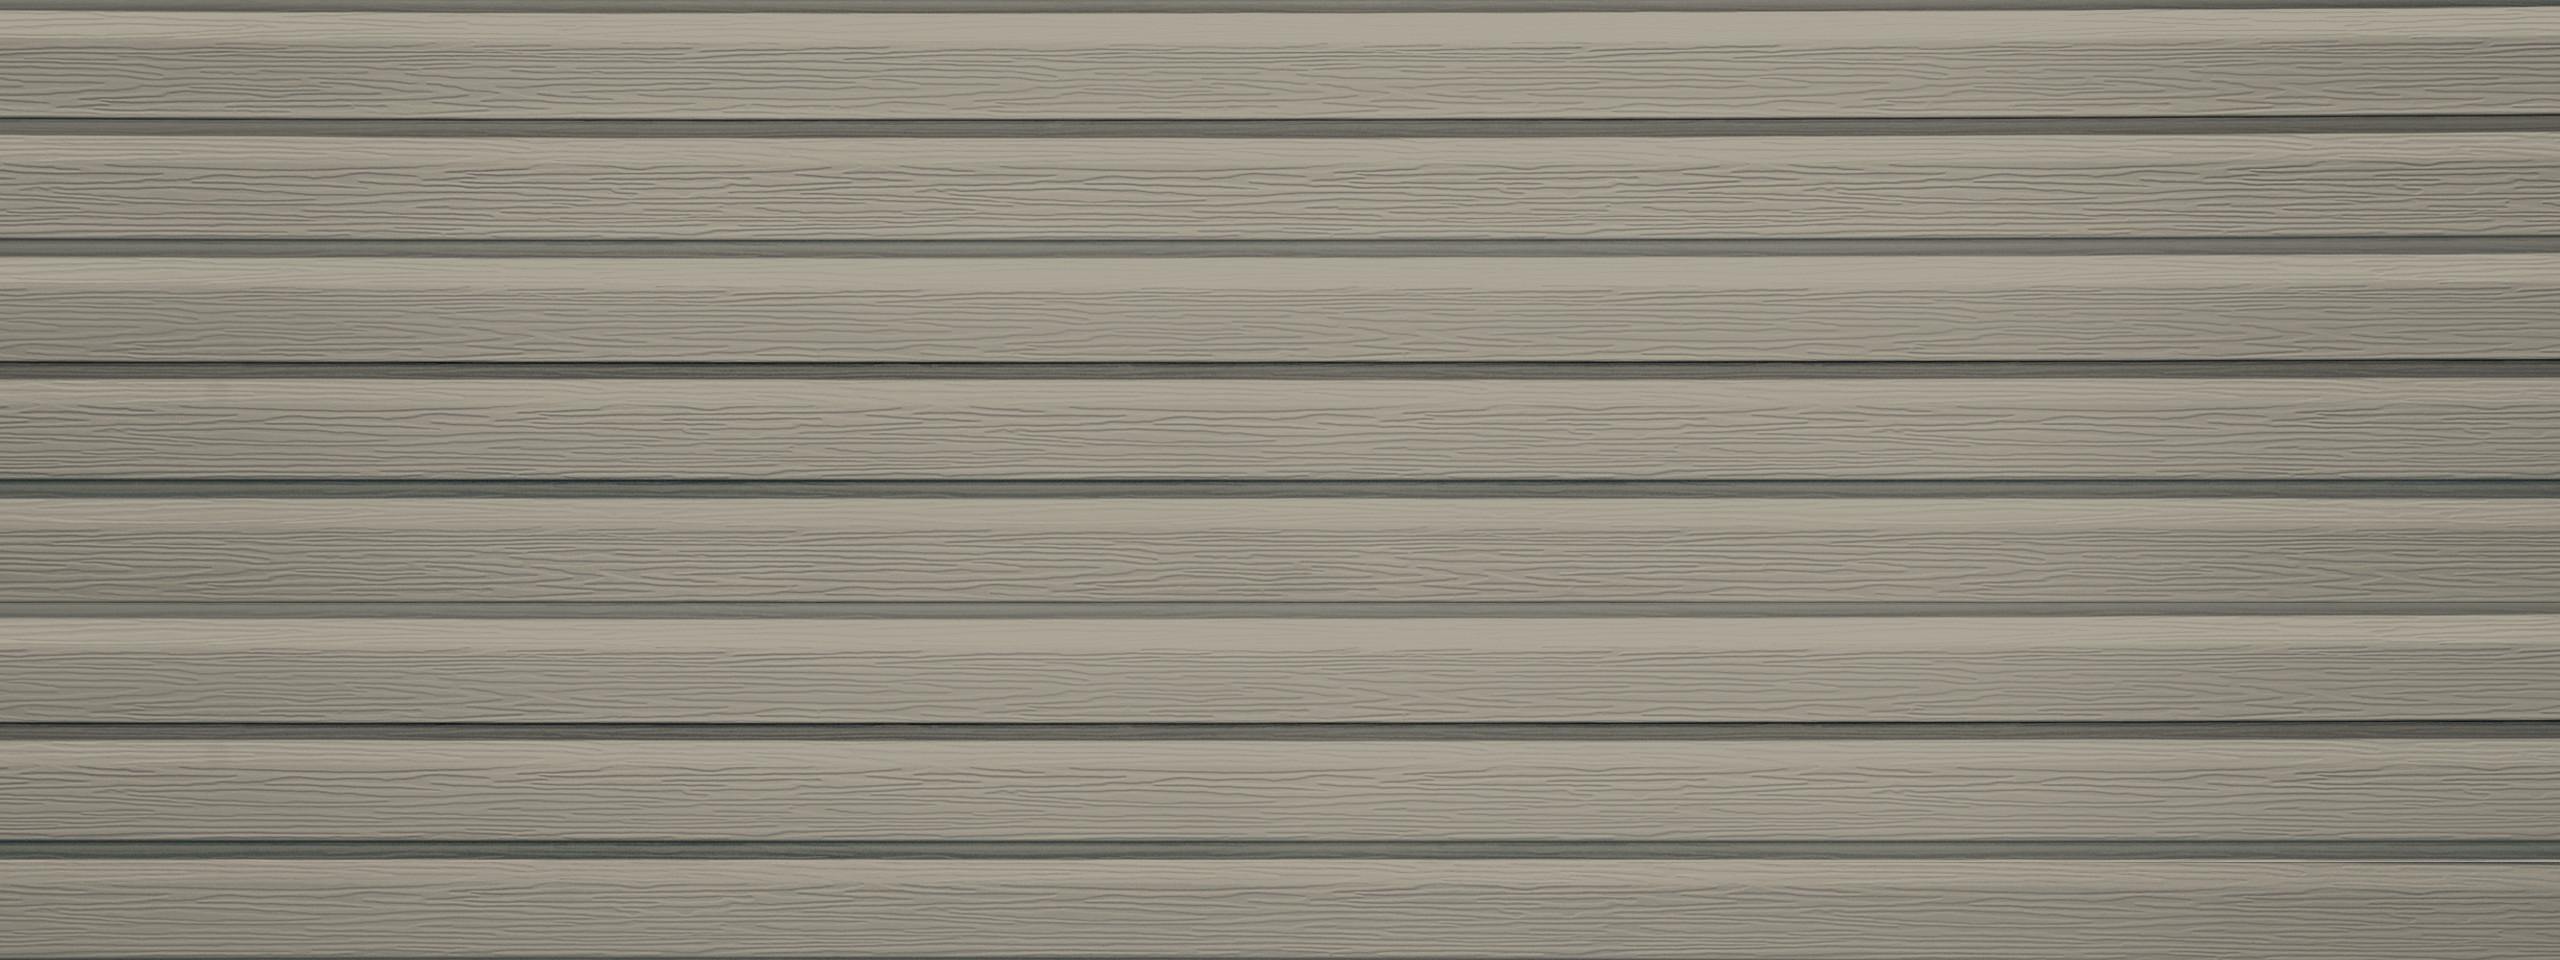 Entex dutchlap sandstone steel siding